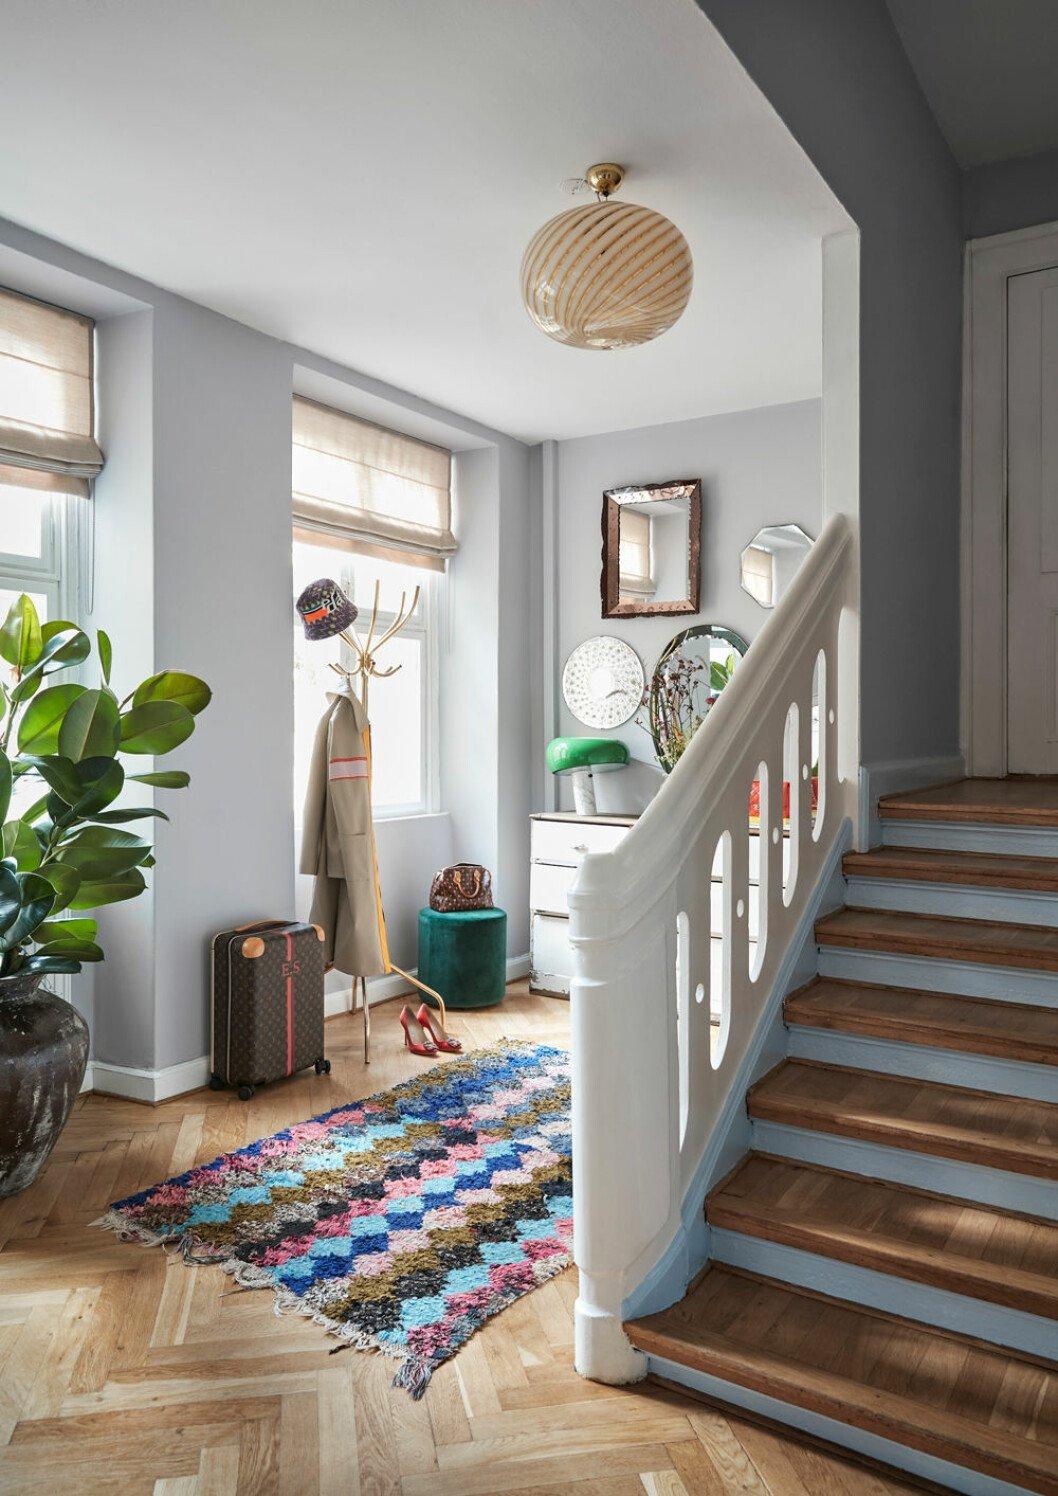 Hemma hos Emili Sindlev Köpenhamn hall trappa